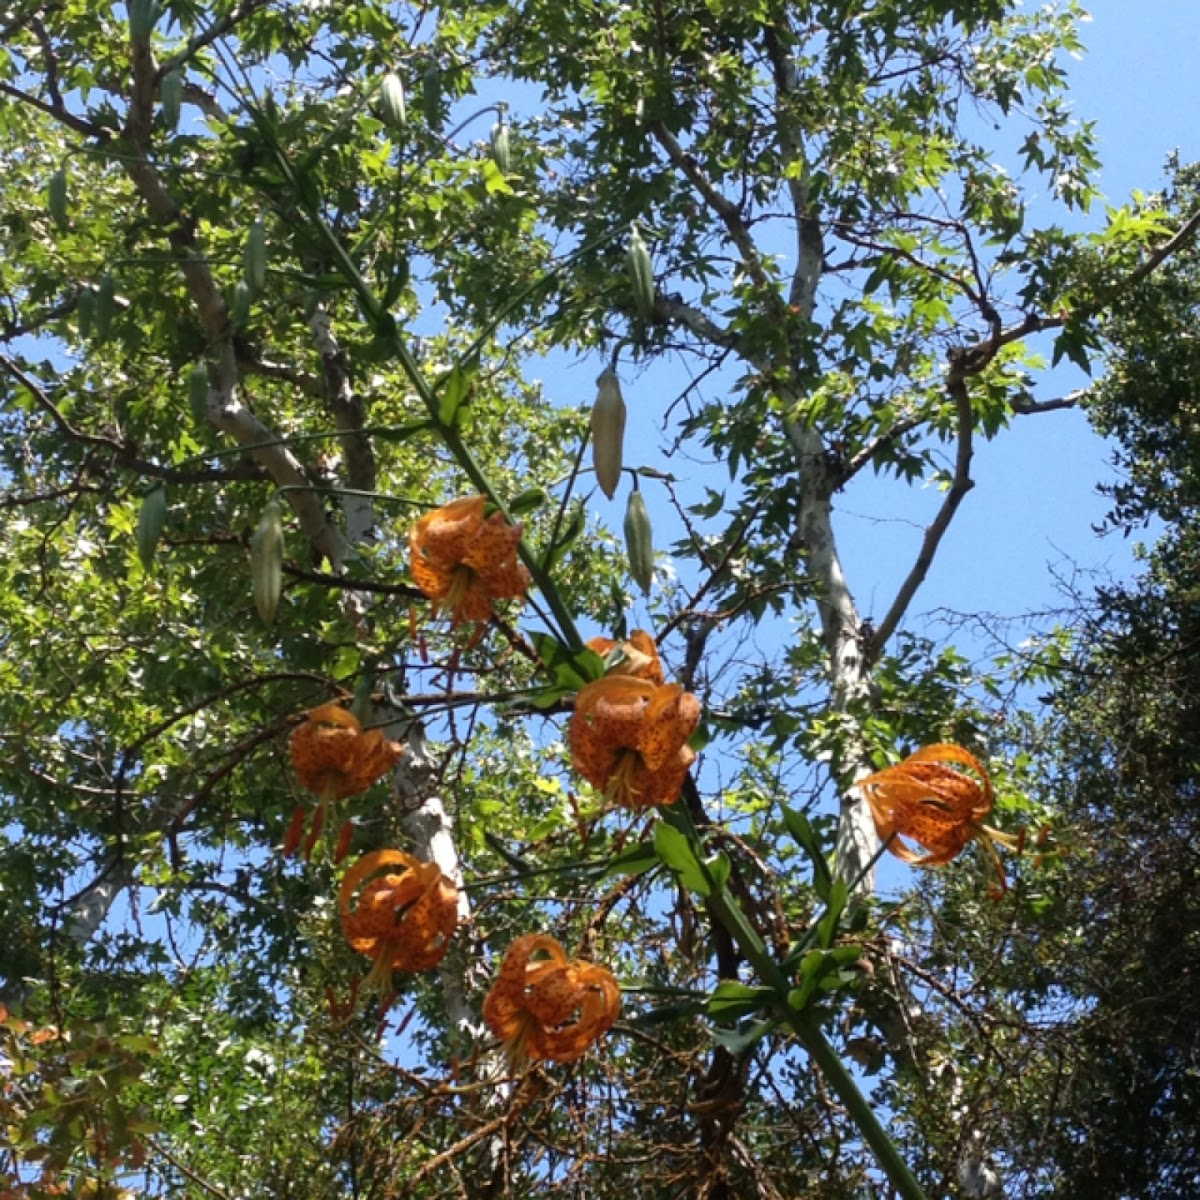 Humboldt's tiger lily